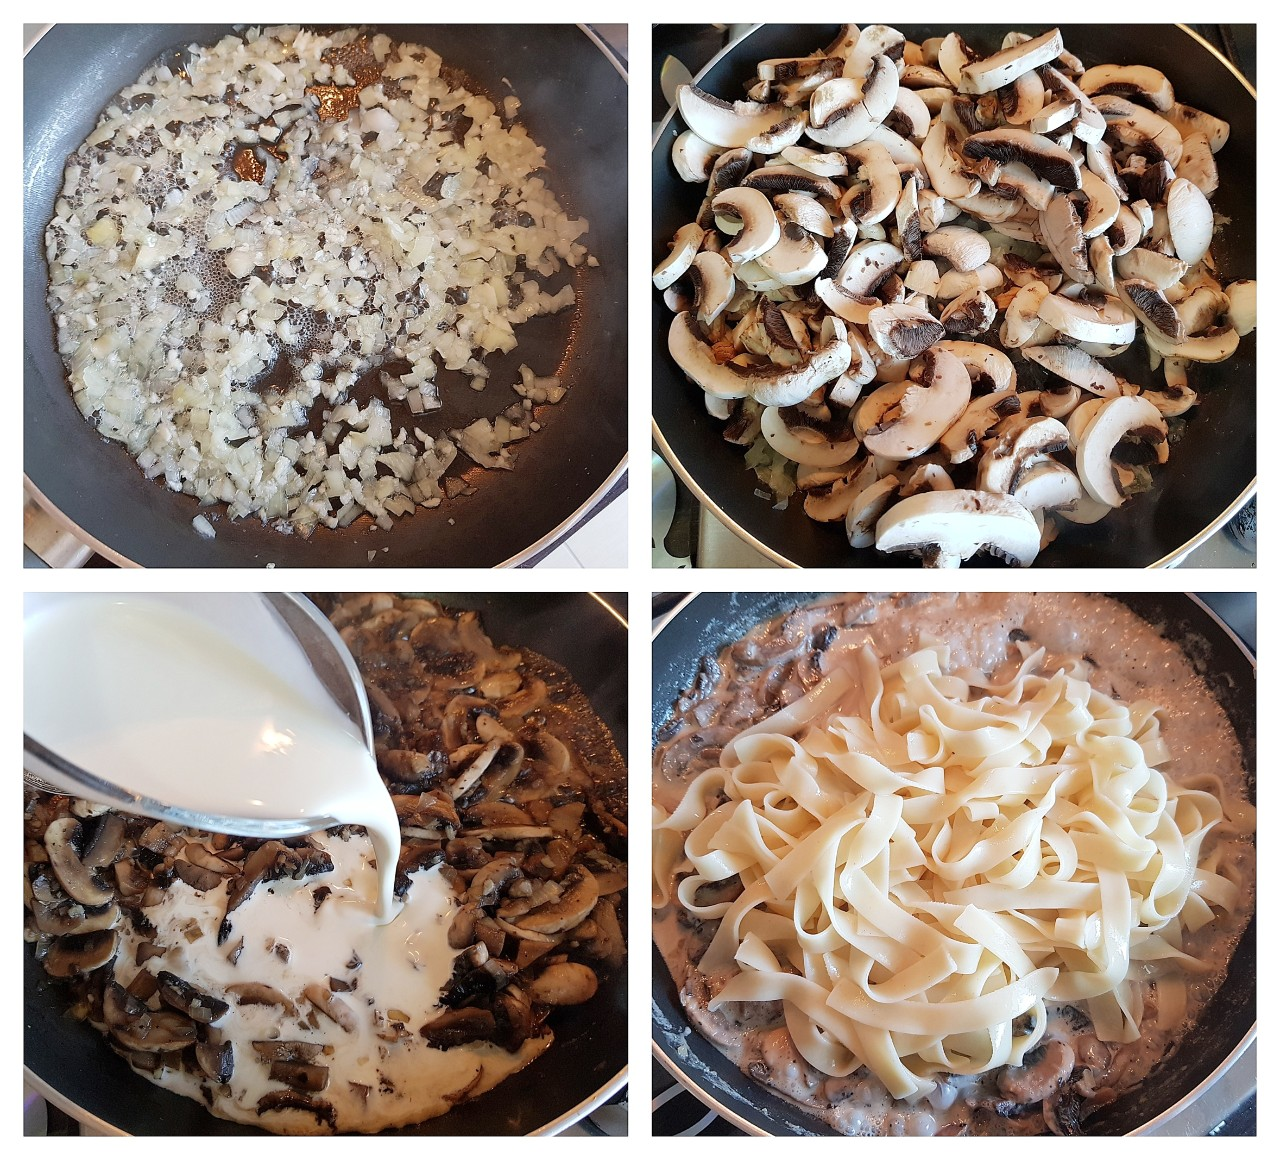 Tagliatelle cu ciuperci si smantana - foodieopedia